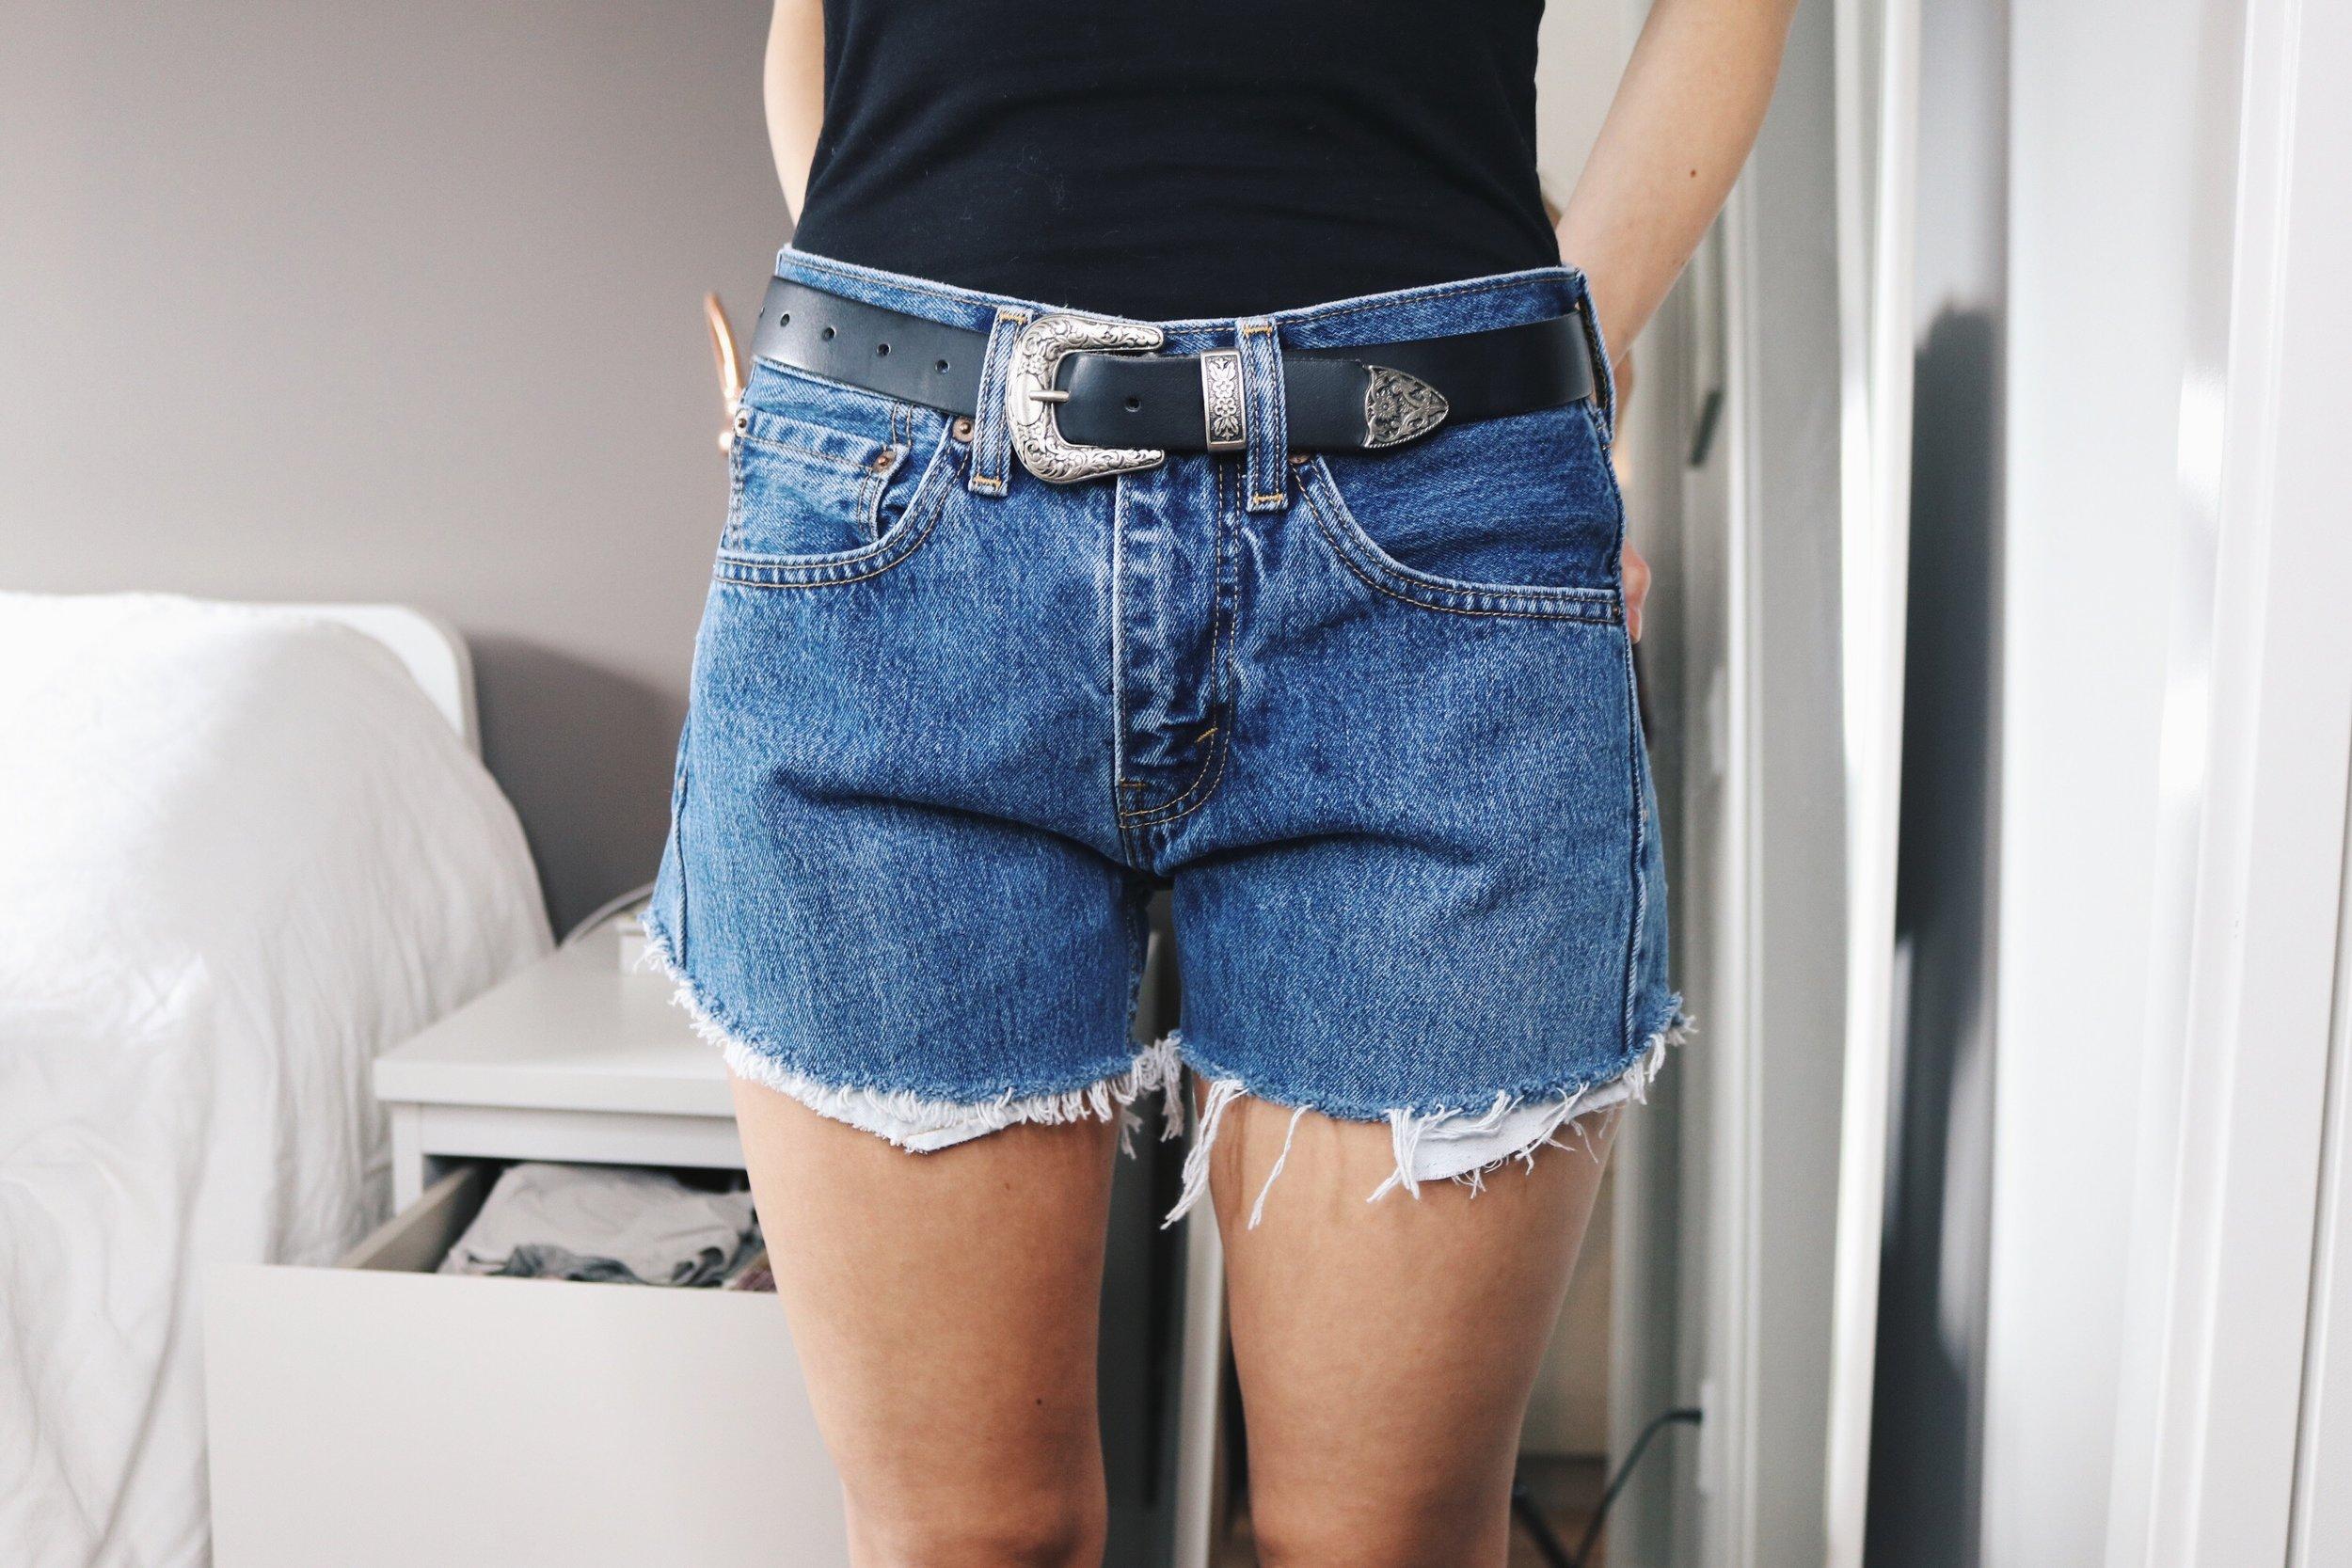 shorts - levi's 505's, belt - b-low the belt